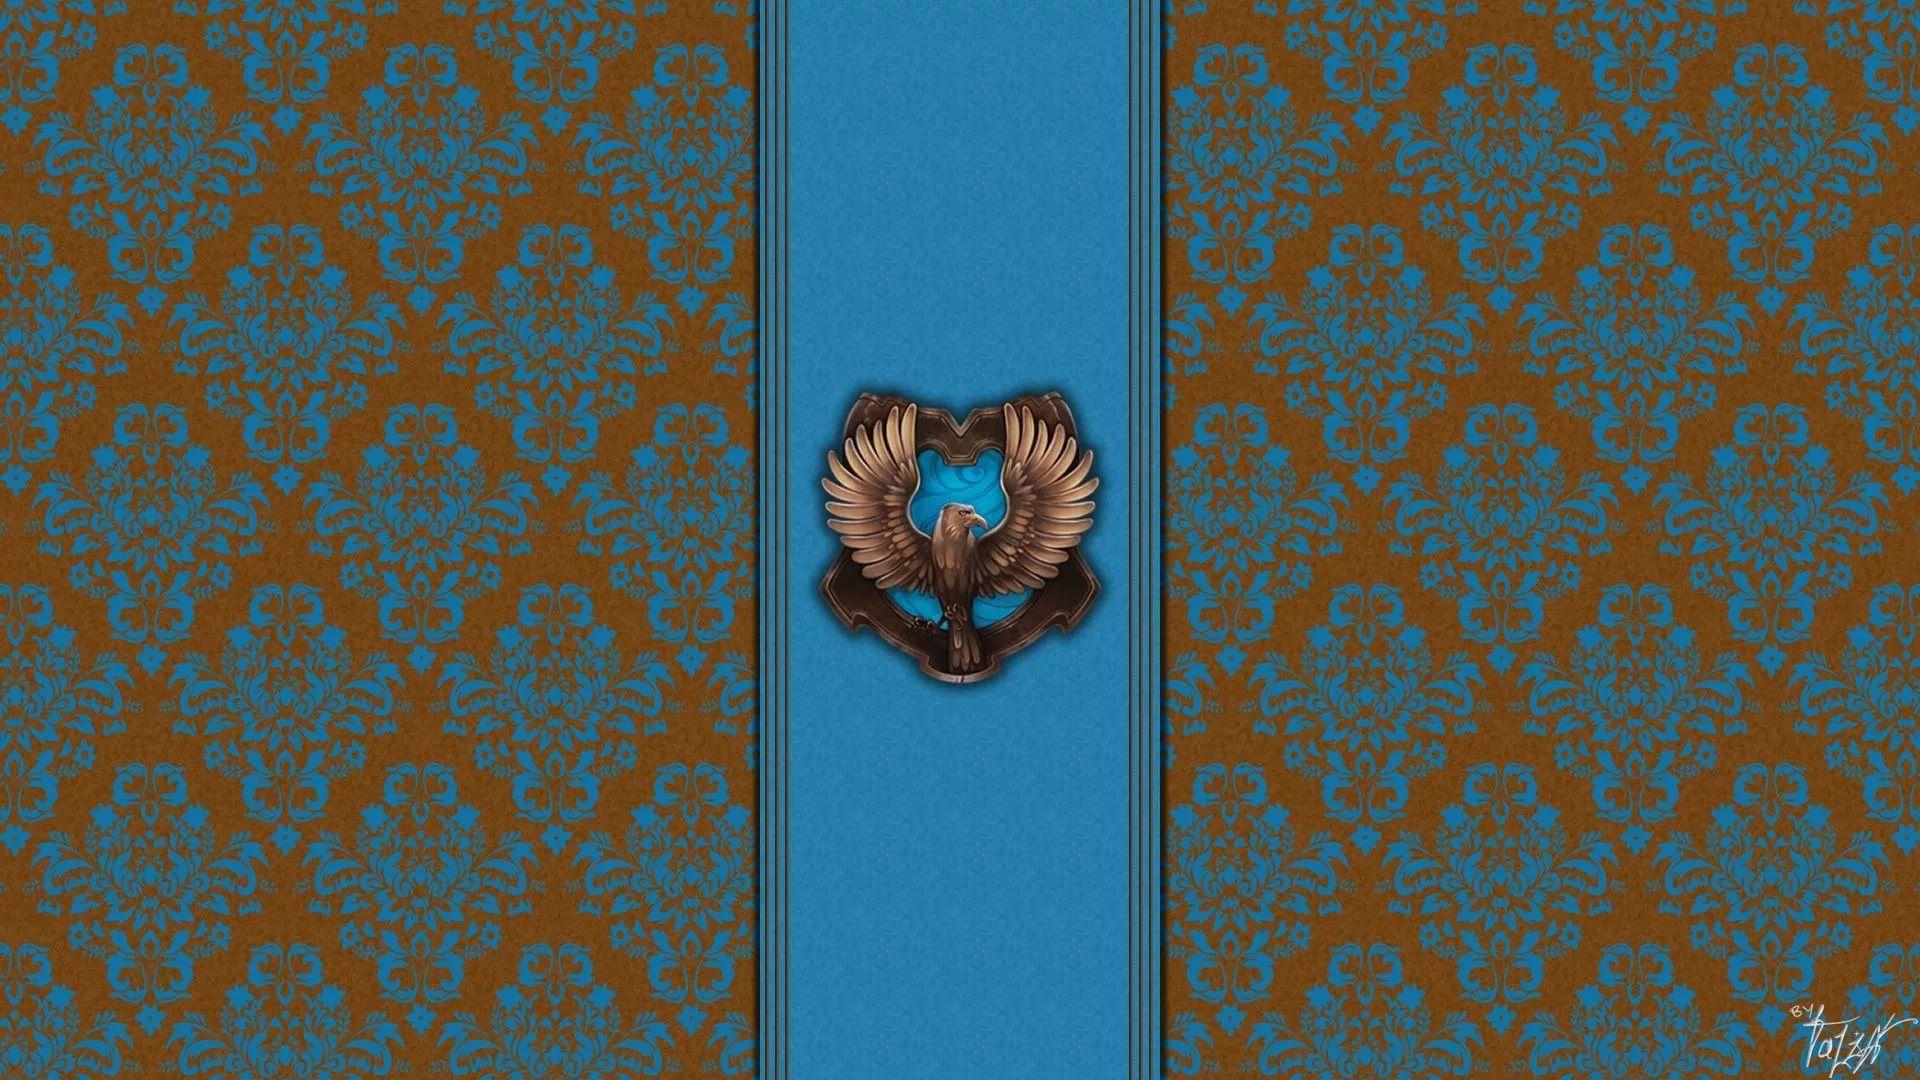 Ravenclaw 1920x1080 wallpaper